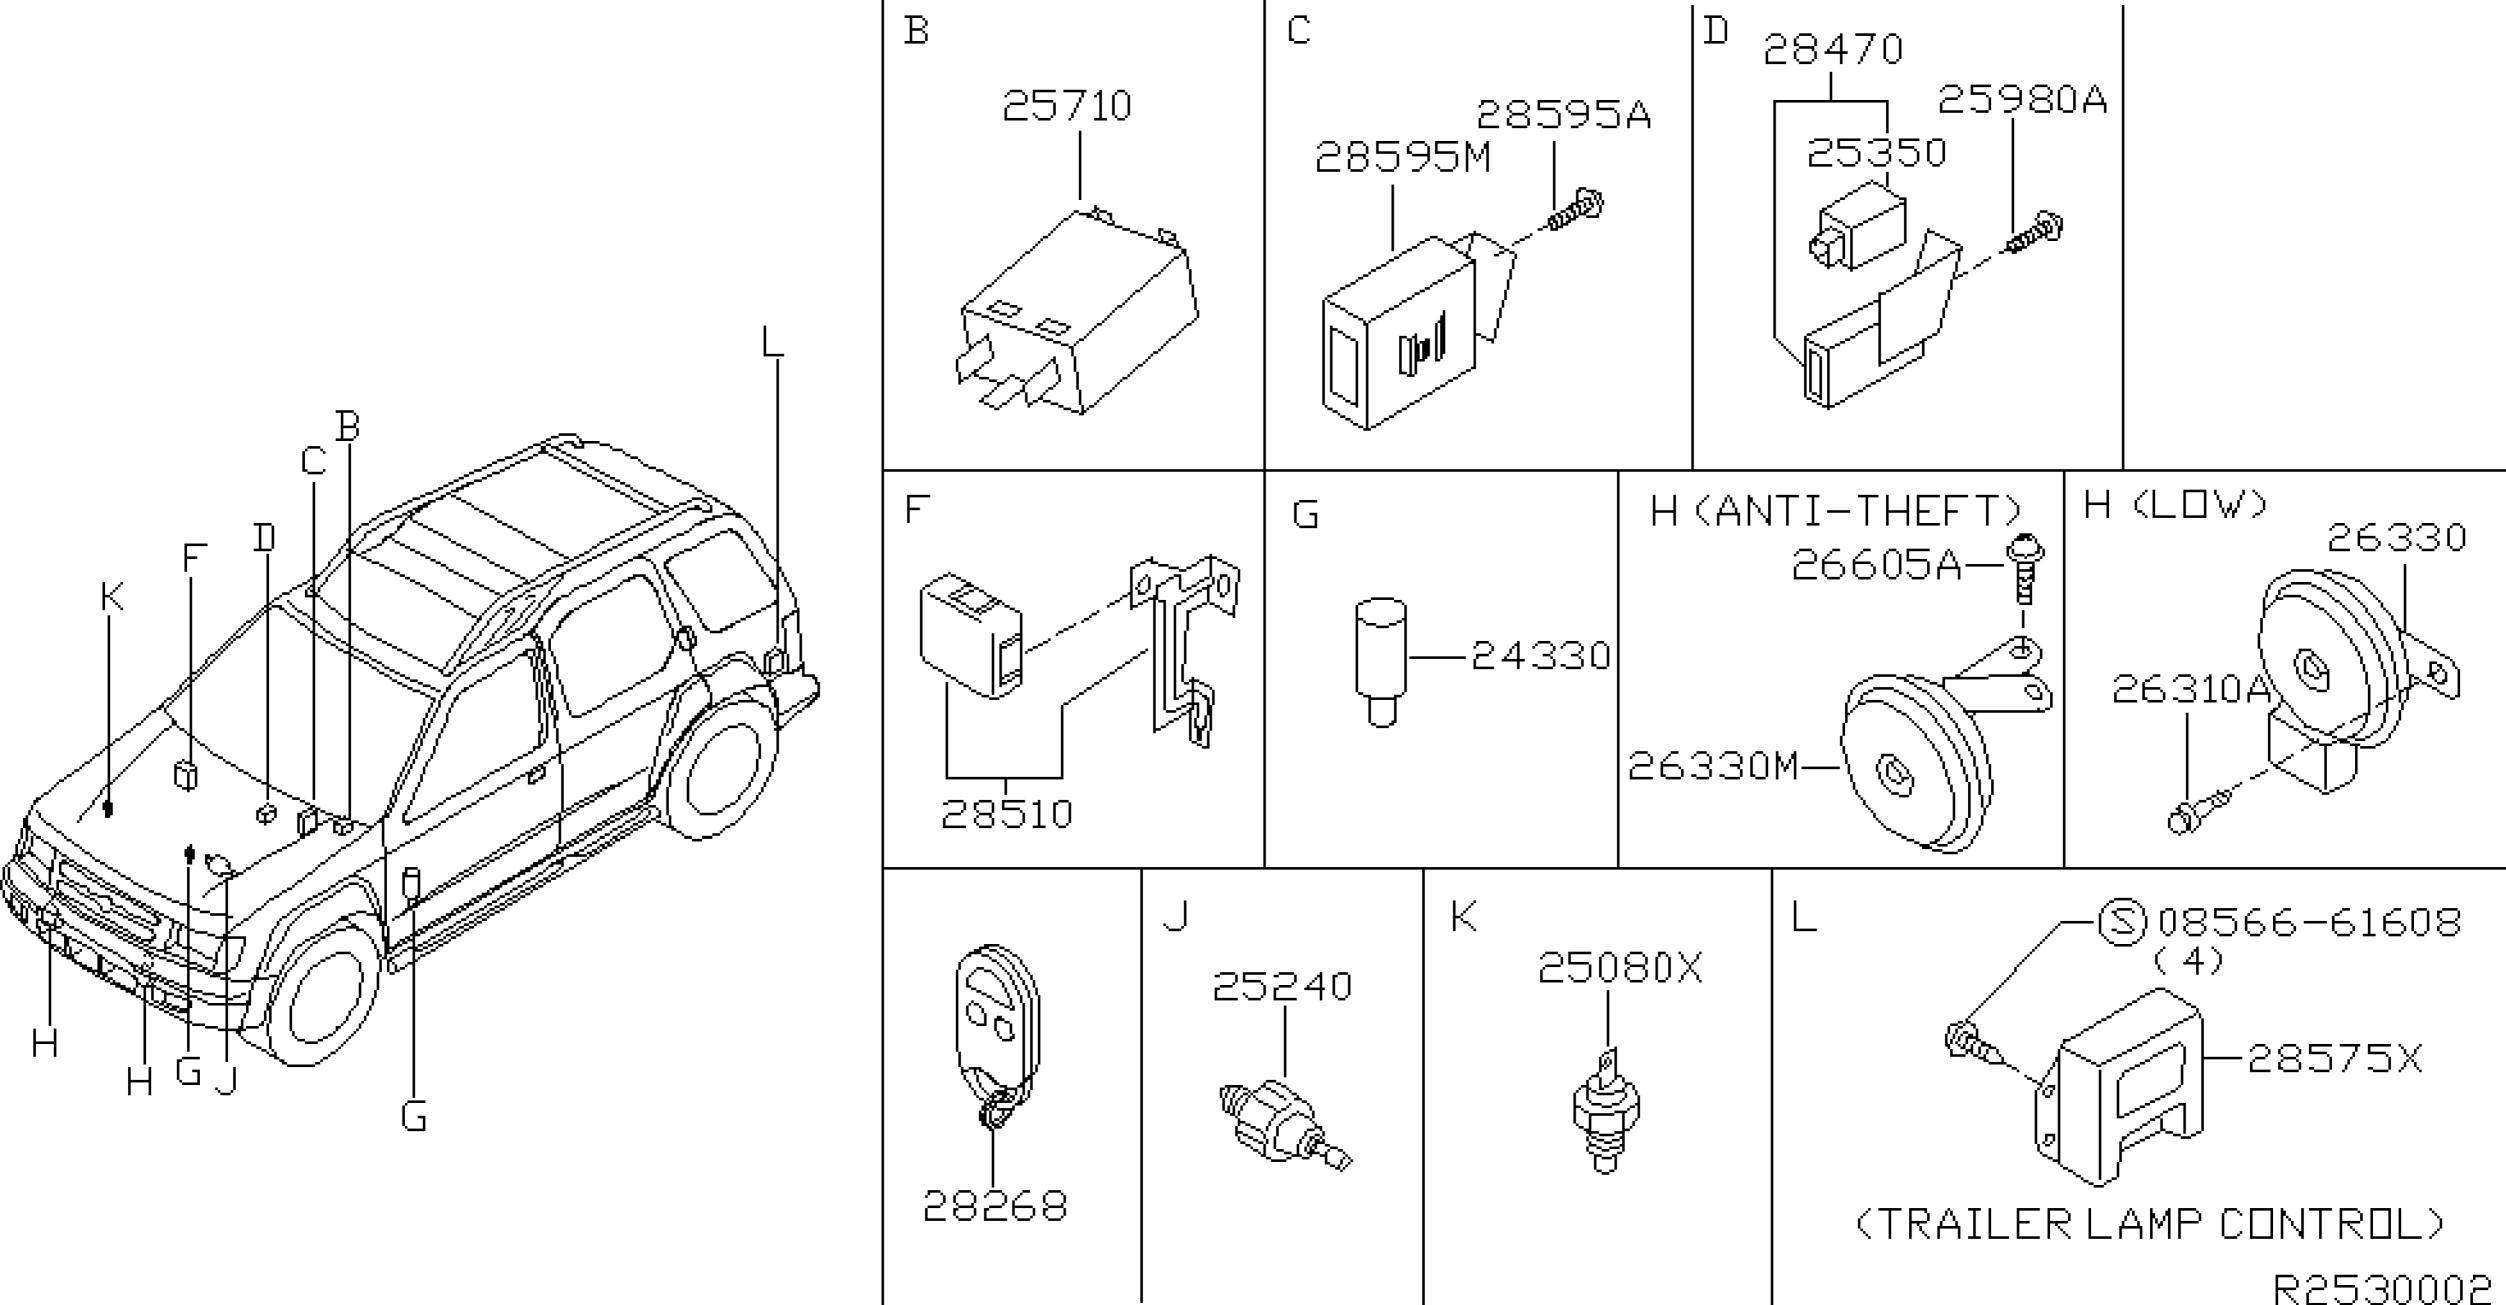 2006 nissan xterra parts diagram 3 phase hydro generator wiring engine